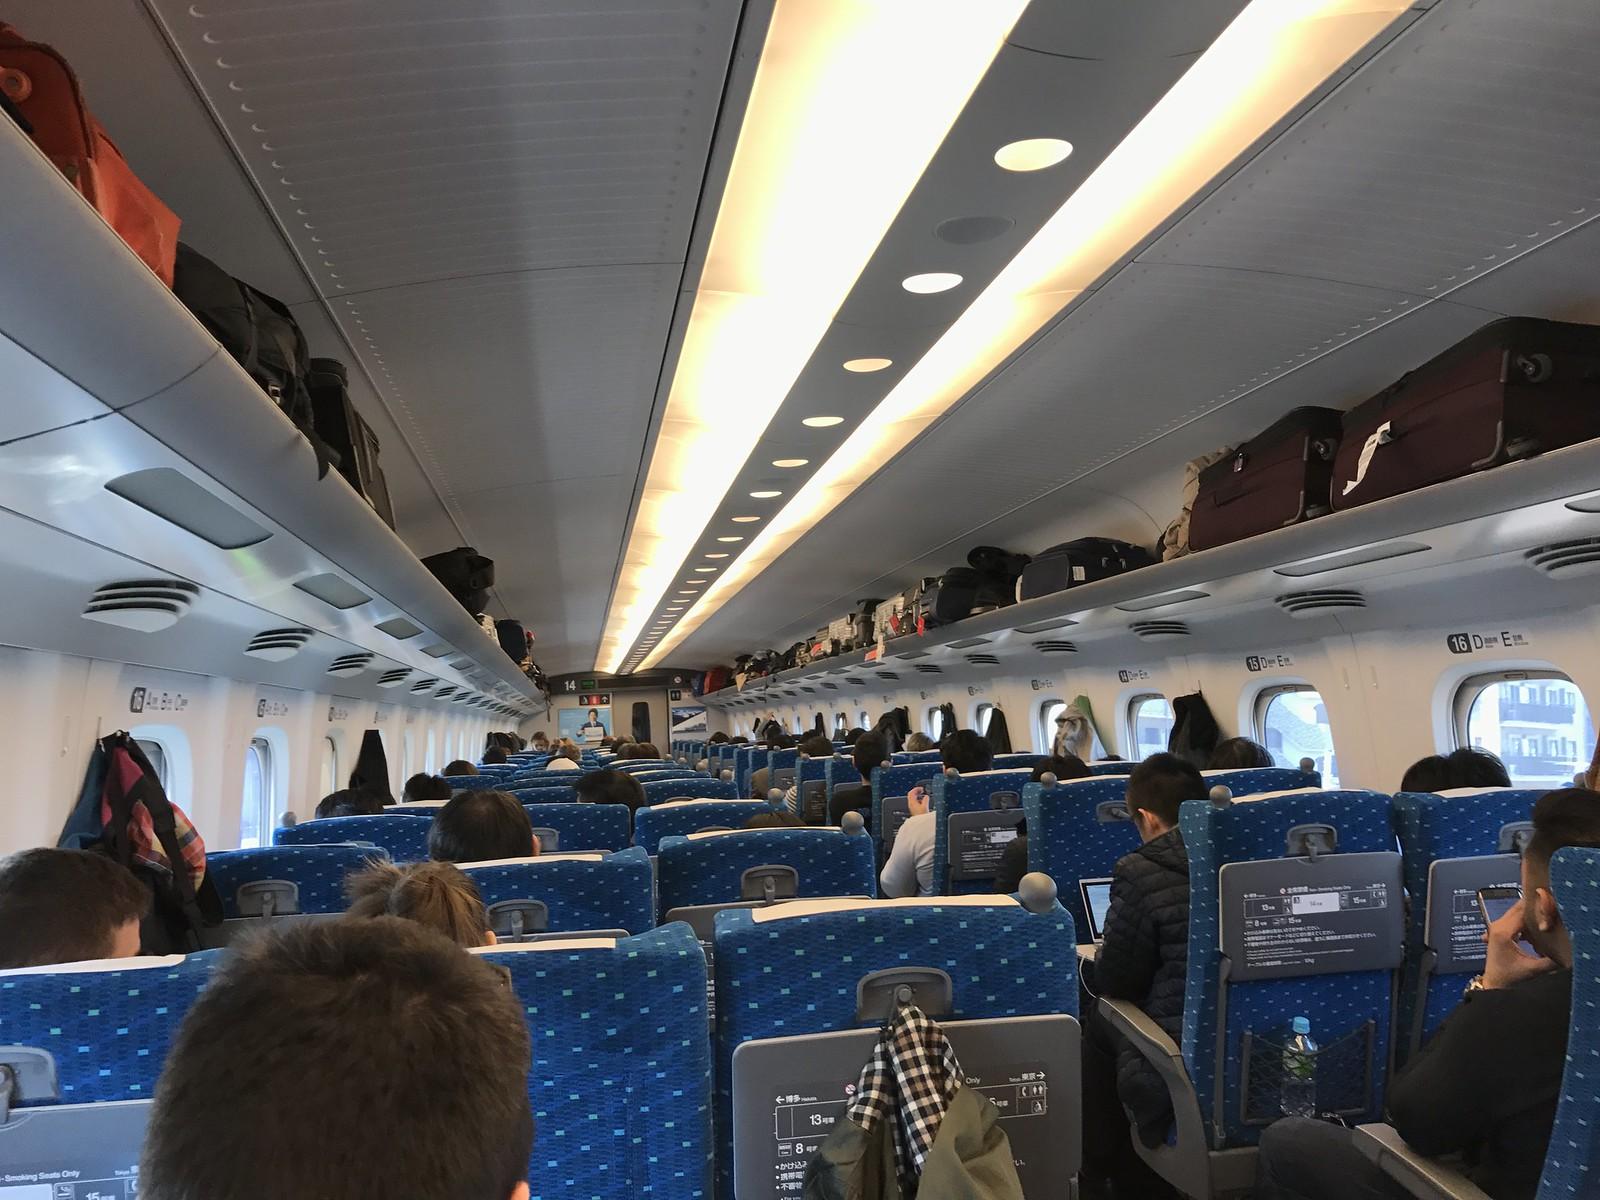 Москва Токио авиабилеты от 15015 руб расписание самолетов